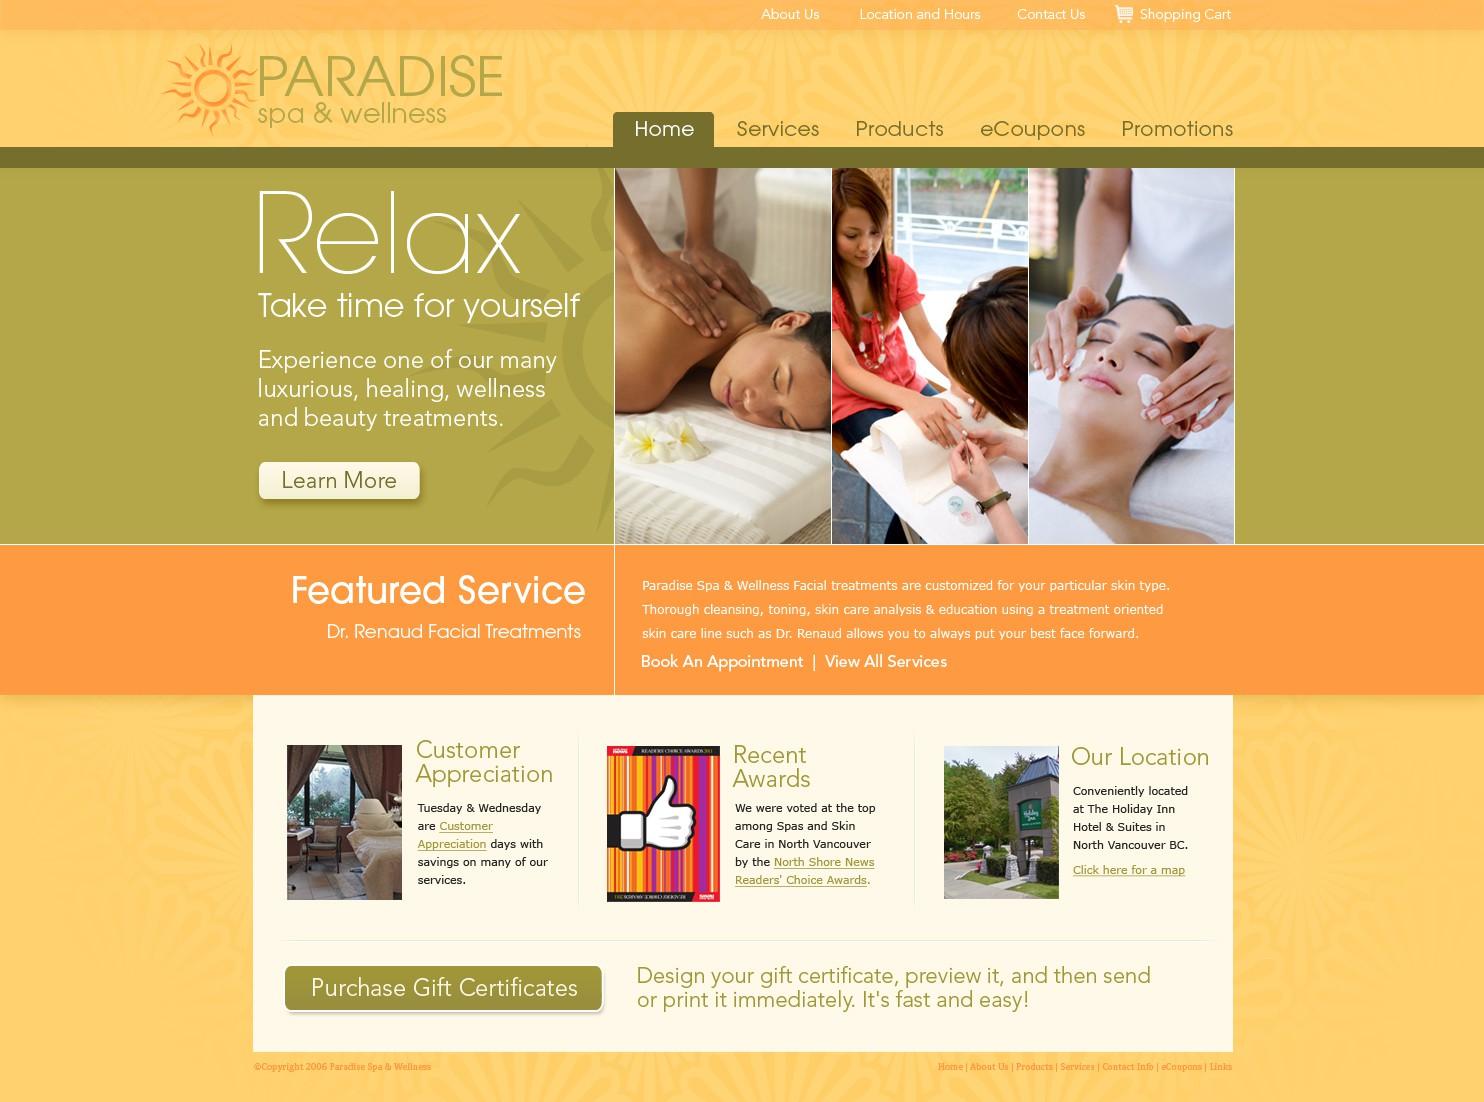 Paradise Spa and Wellness needs a new website design